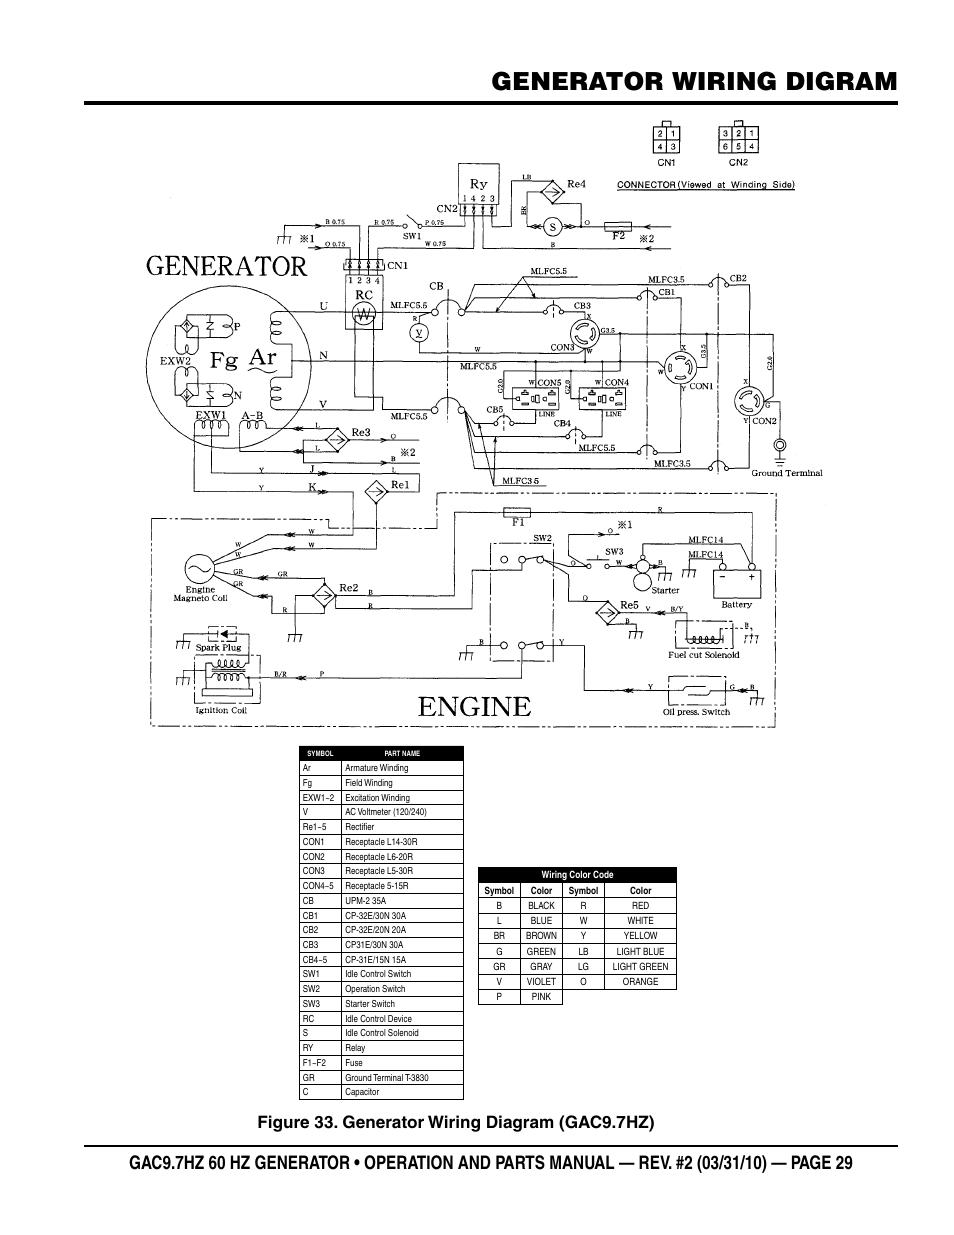 Generator wiring digram, Figure 33. generator wiring